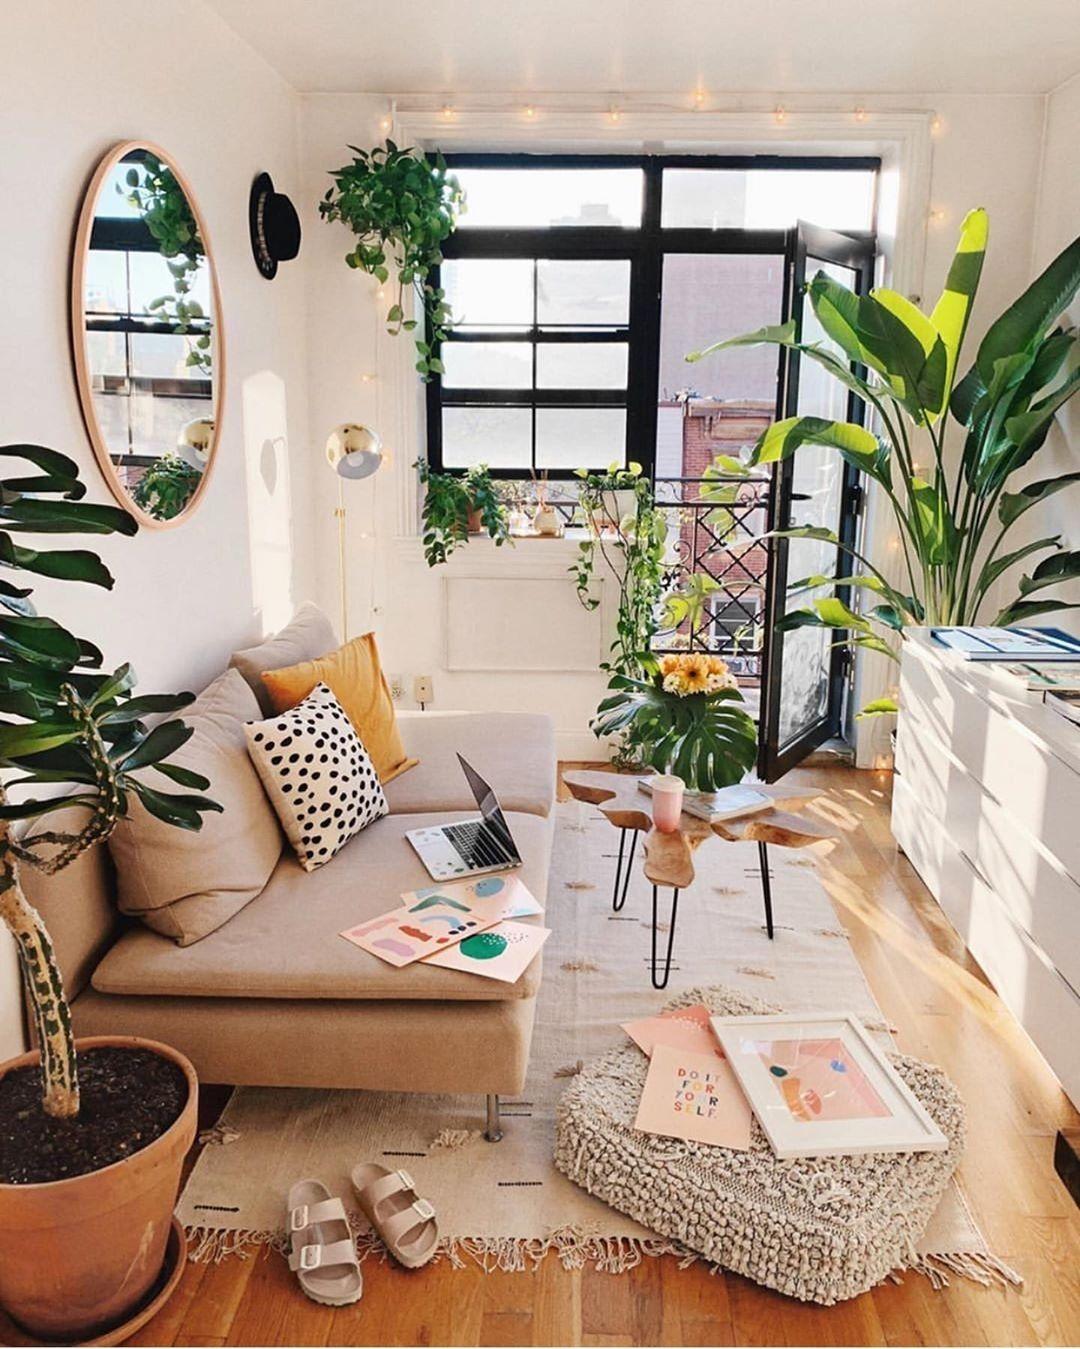 New Stylish Bohemian Home Decor Ideas House Interior Home Living Room Decor